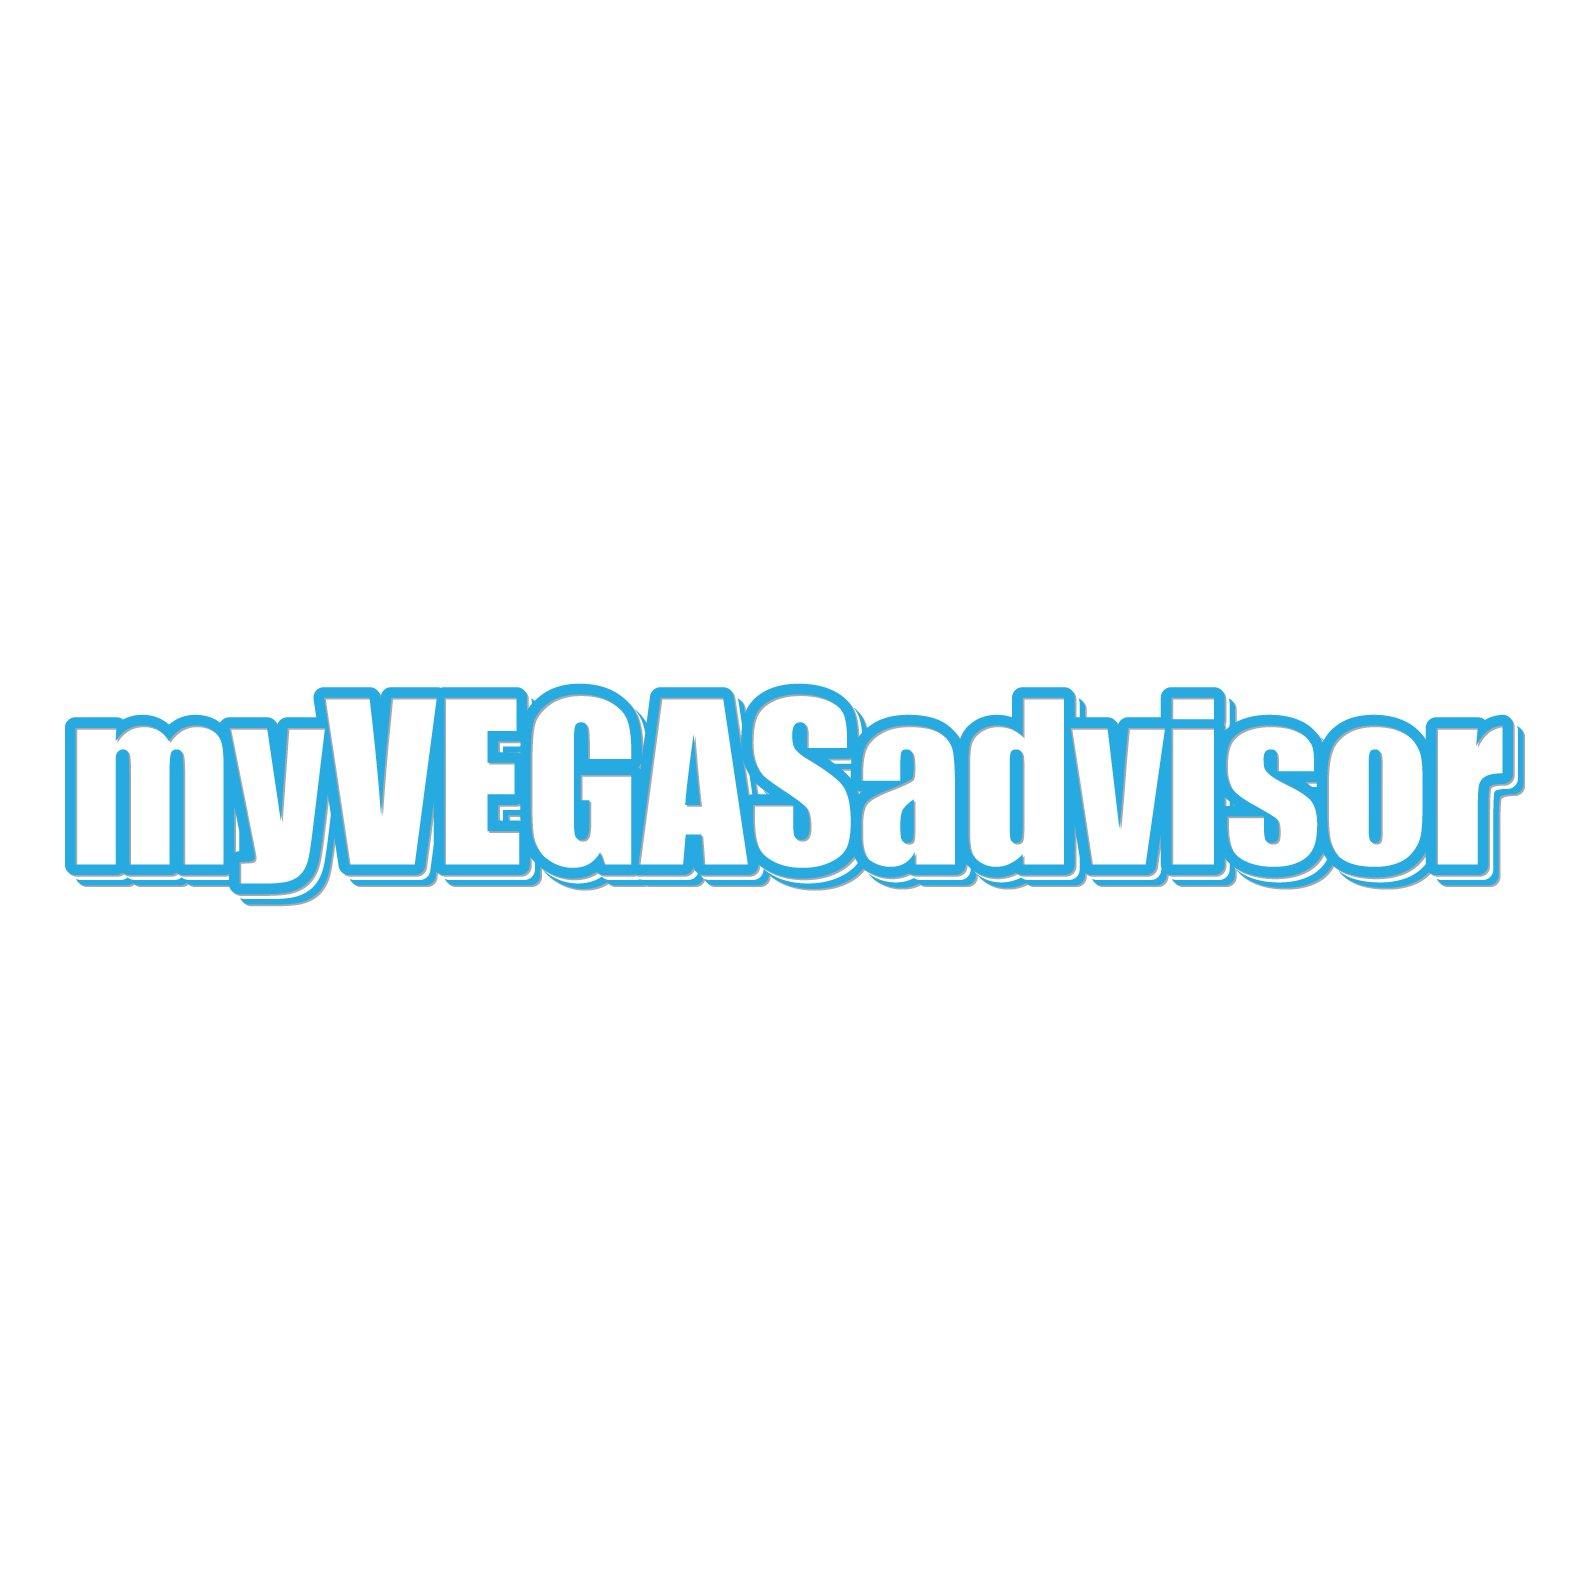 Myvegas chip advisor